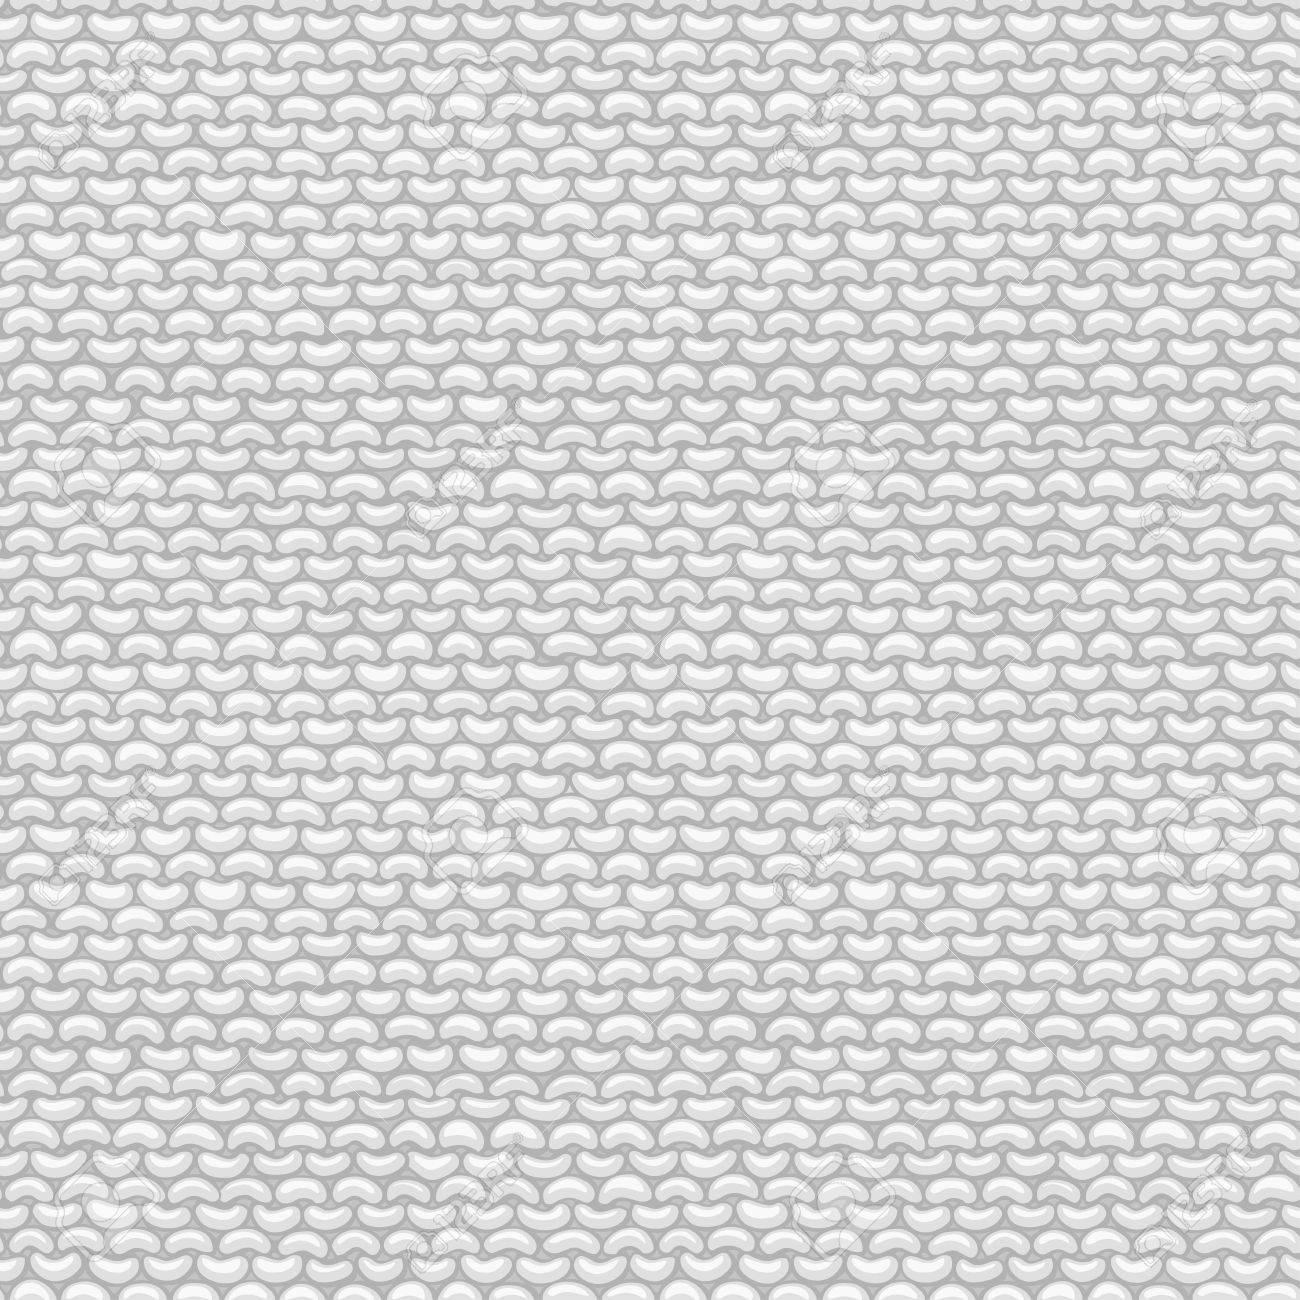 Seamless Pattern of Garter Stitch. Stockinette stitch, reverse..